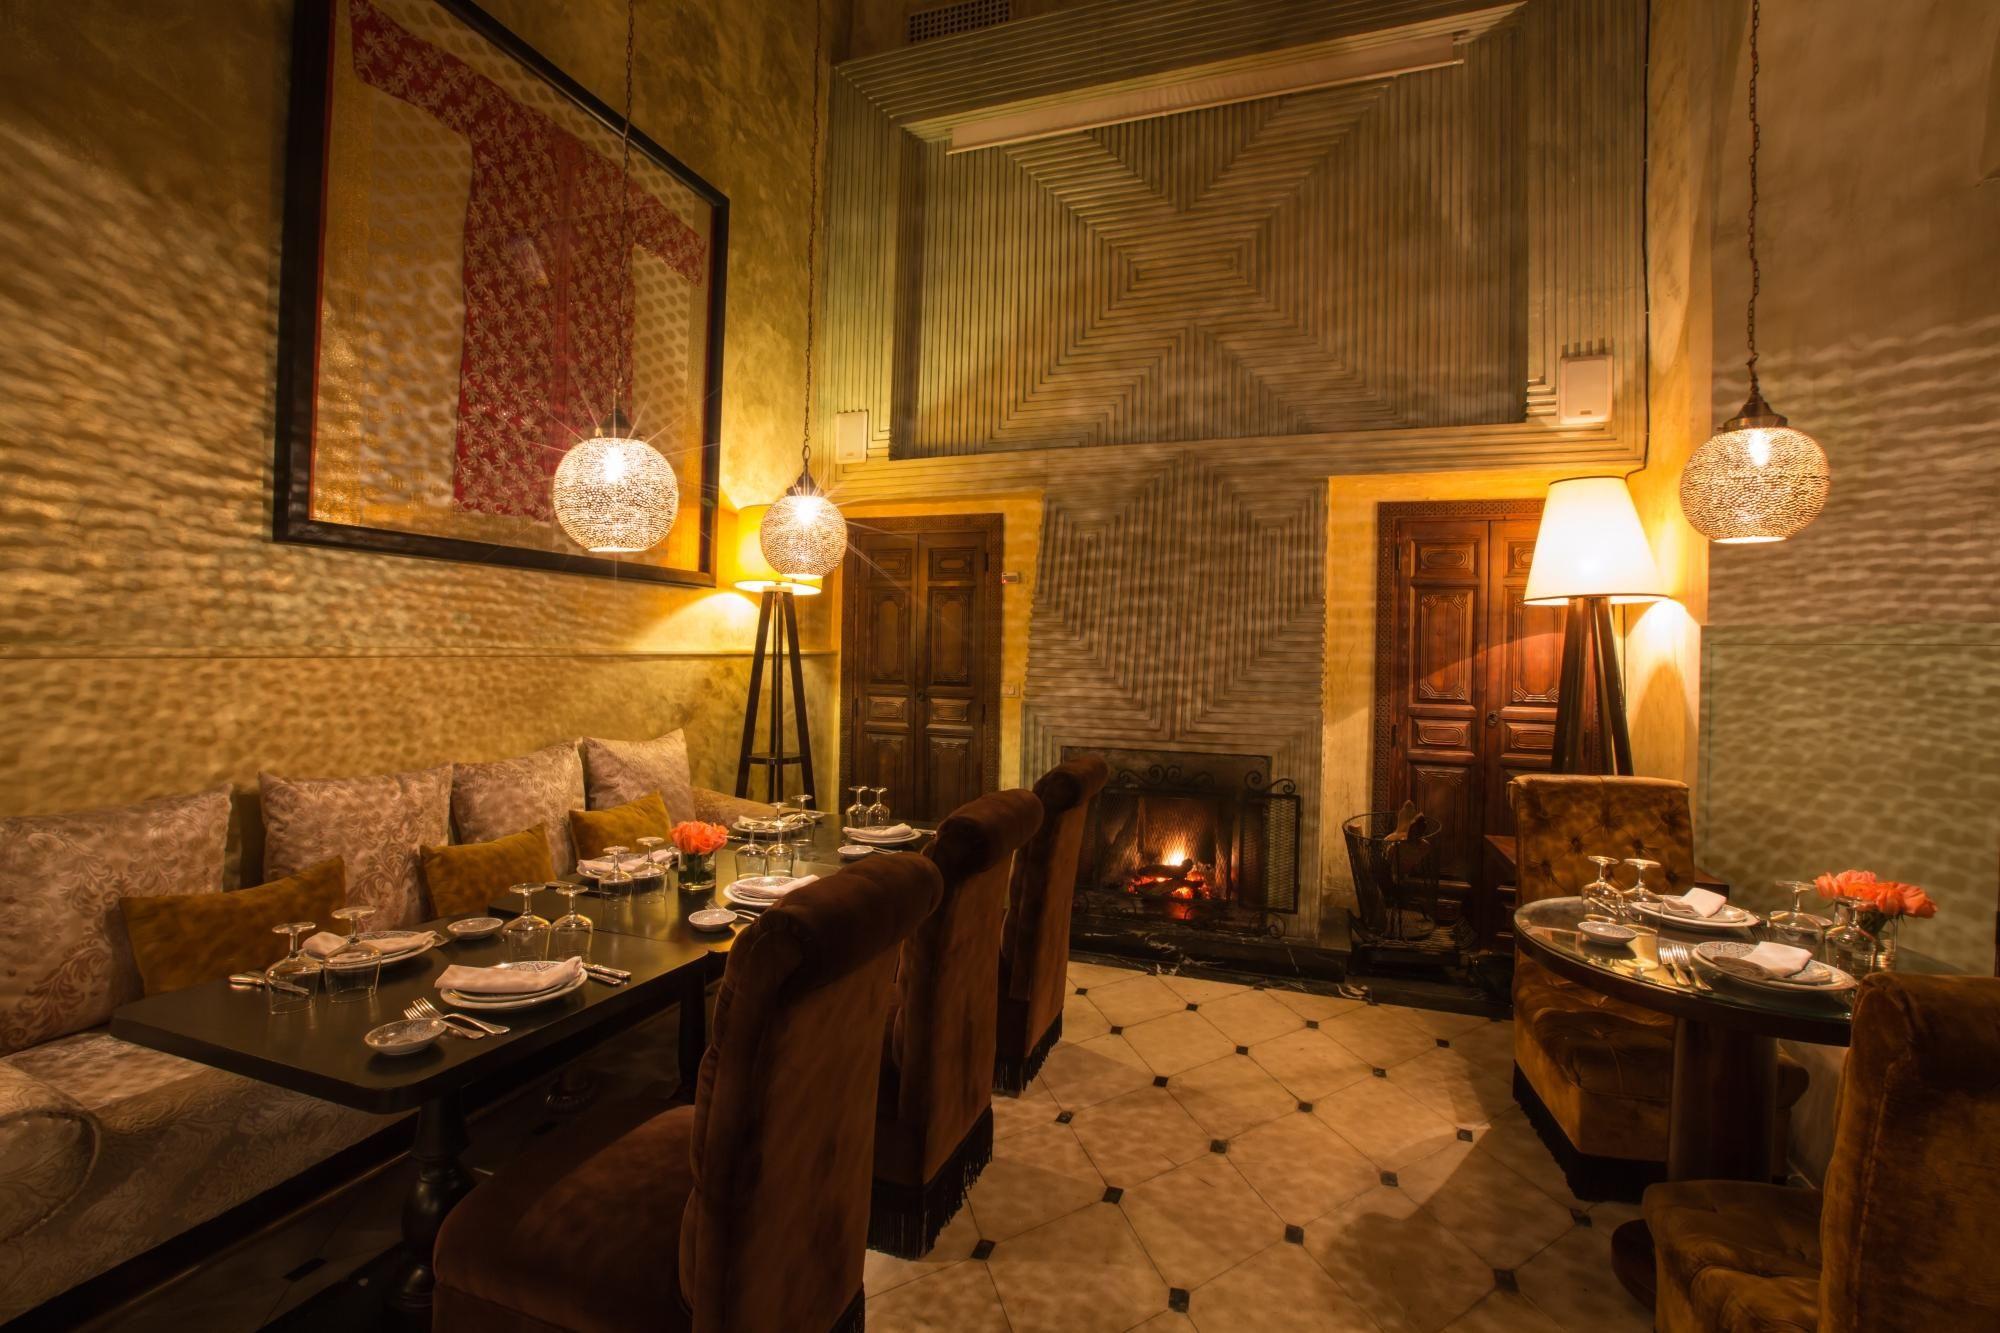 Restaurant Marocain Lotus Privilège, Marrakech